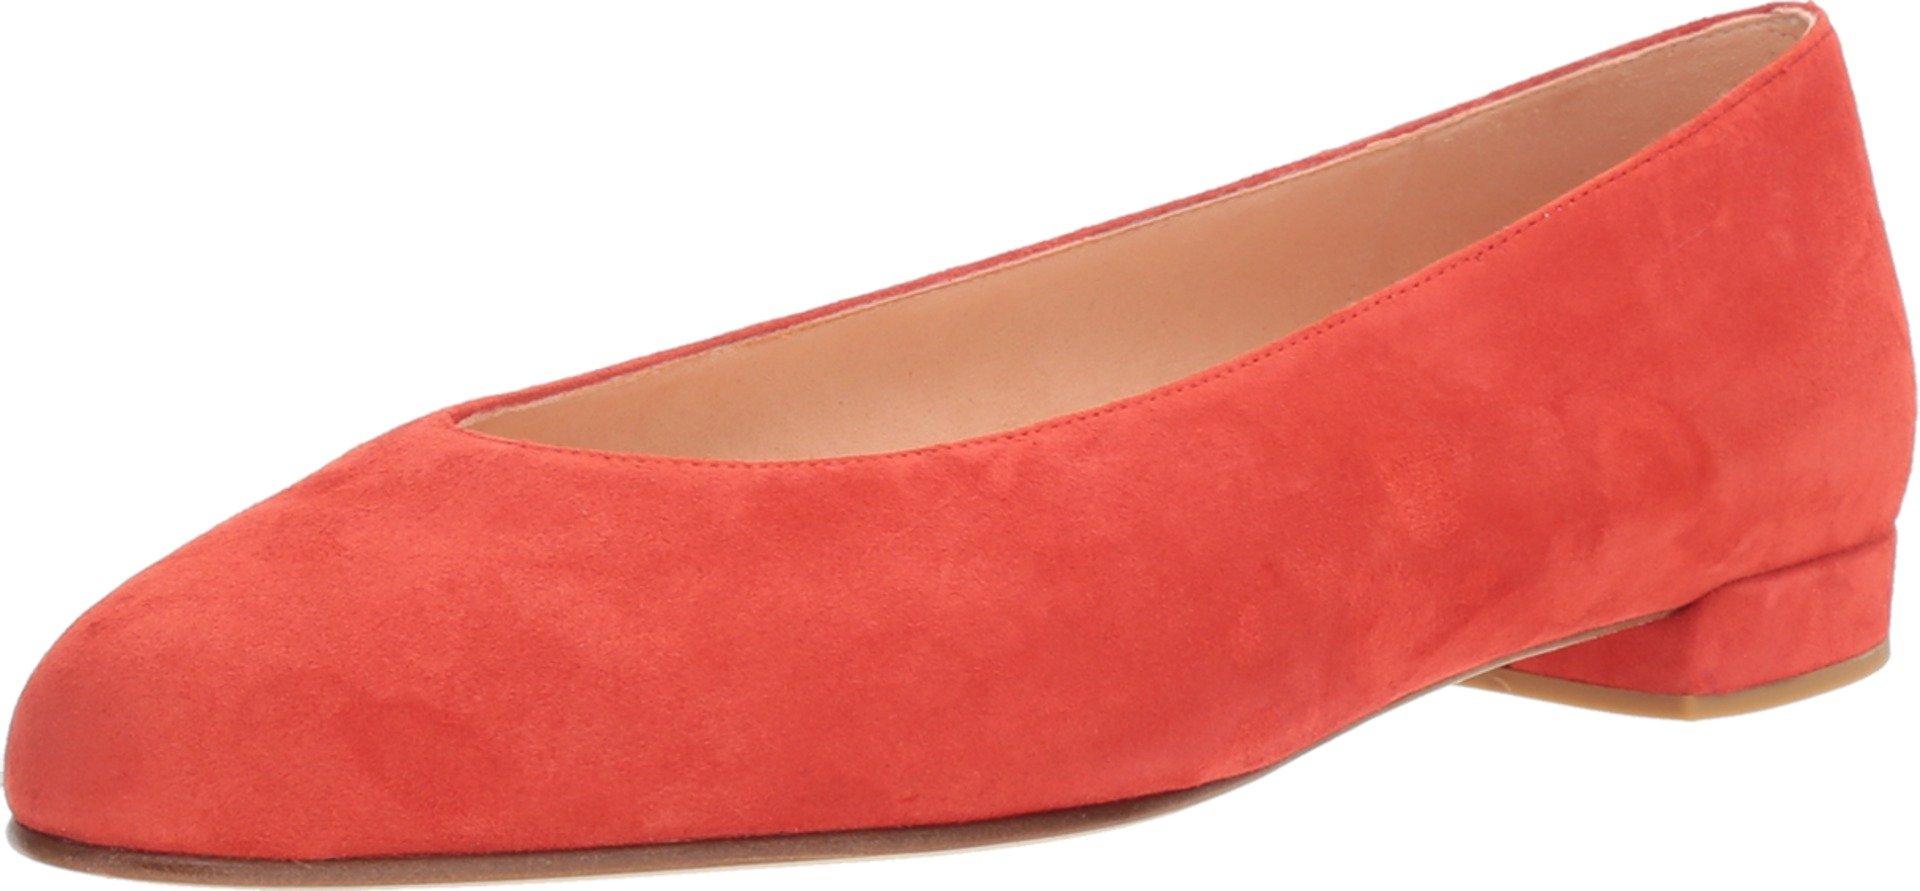 Stuart Weitzman Women's Chicflat Pimento Suede Shoe